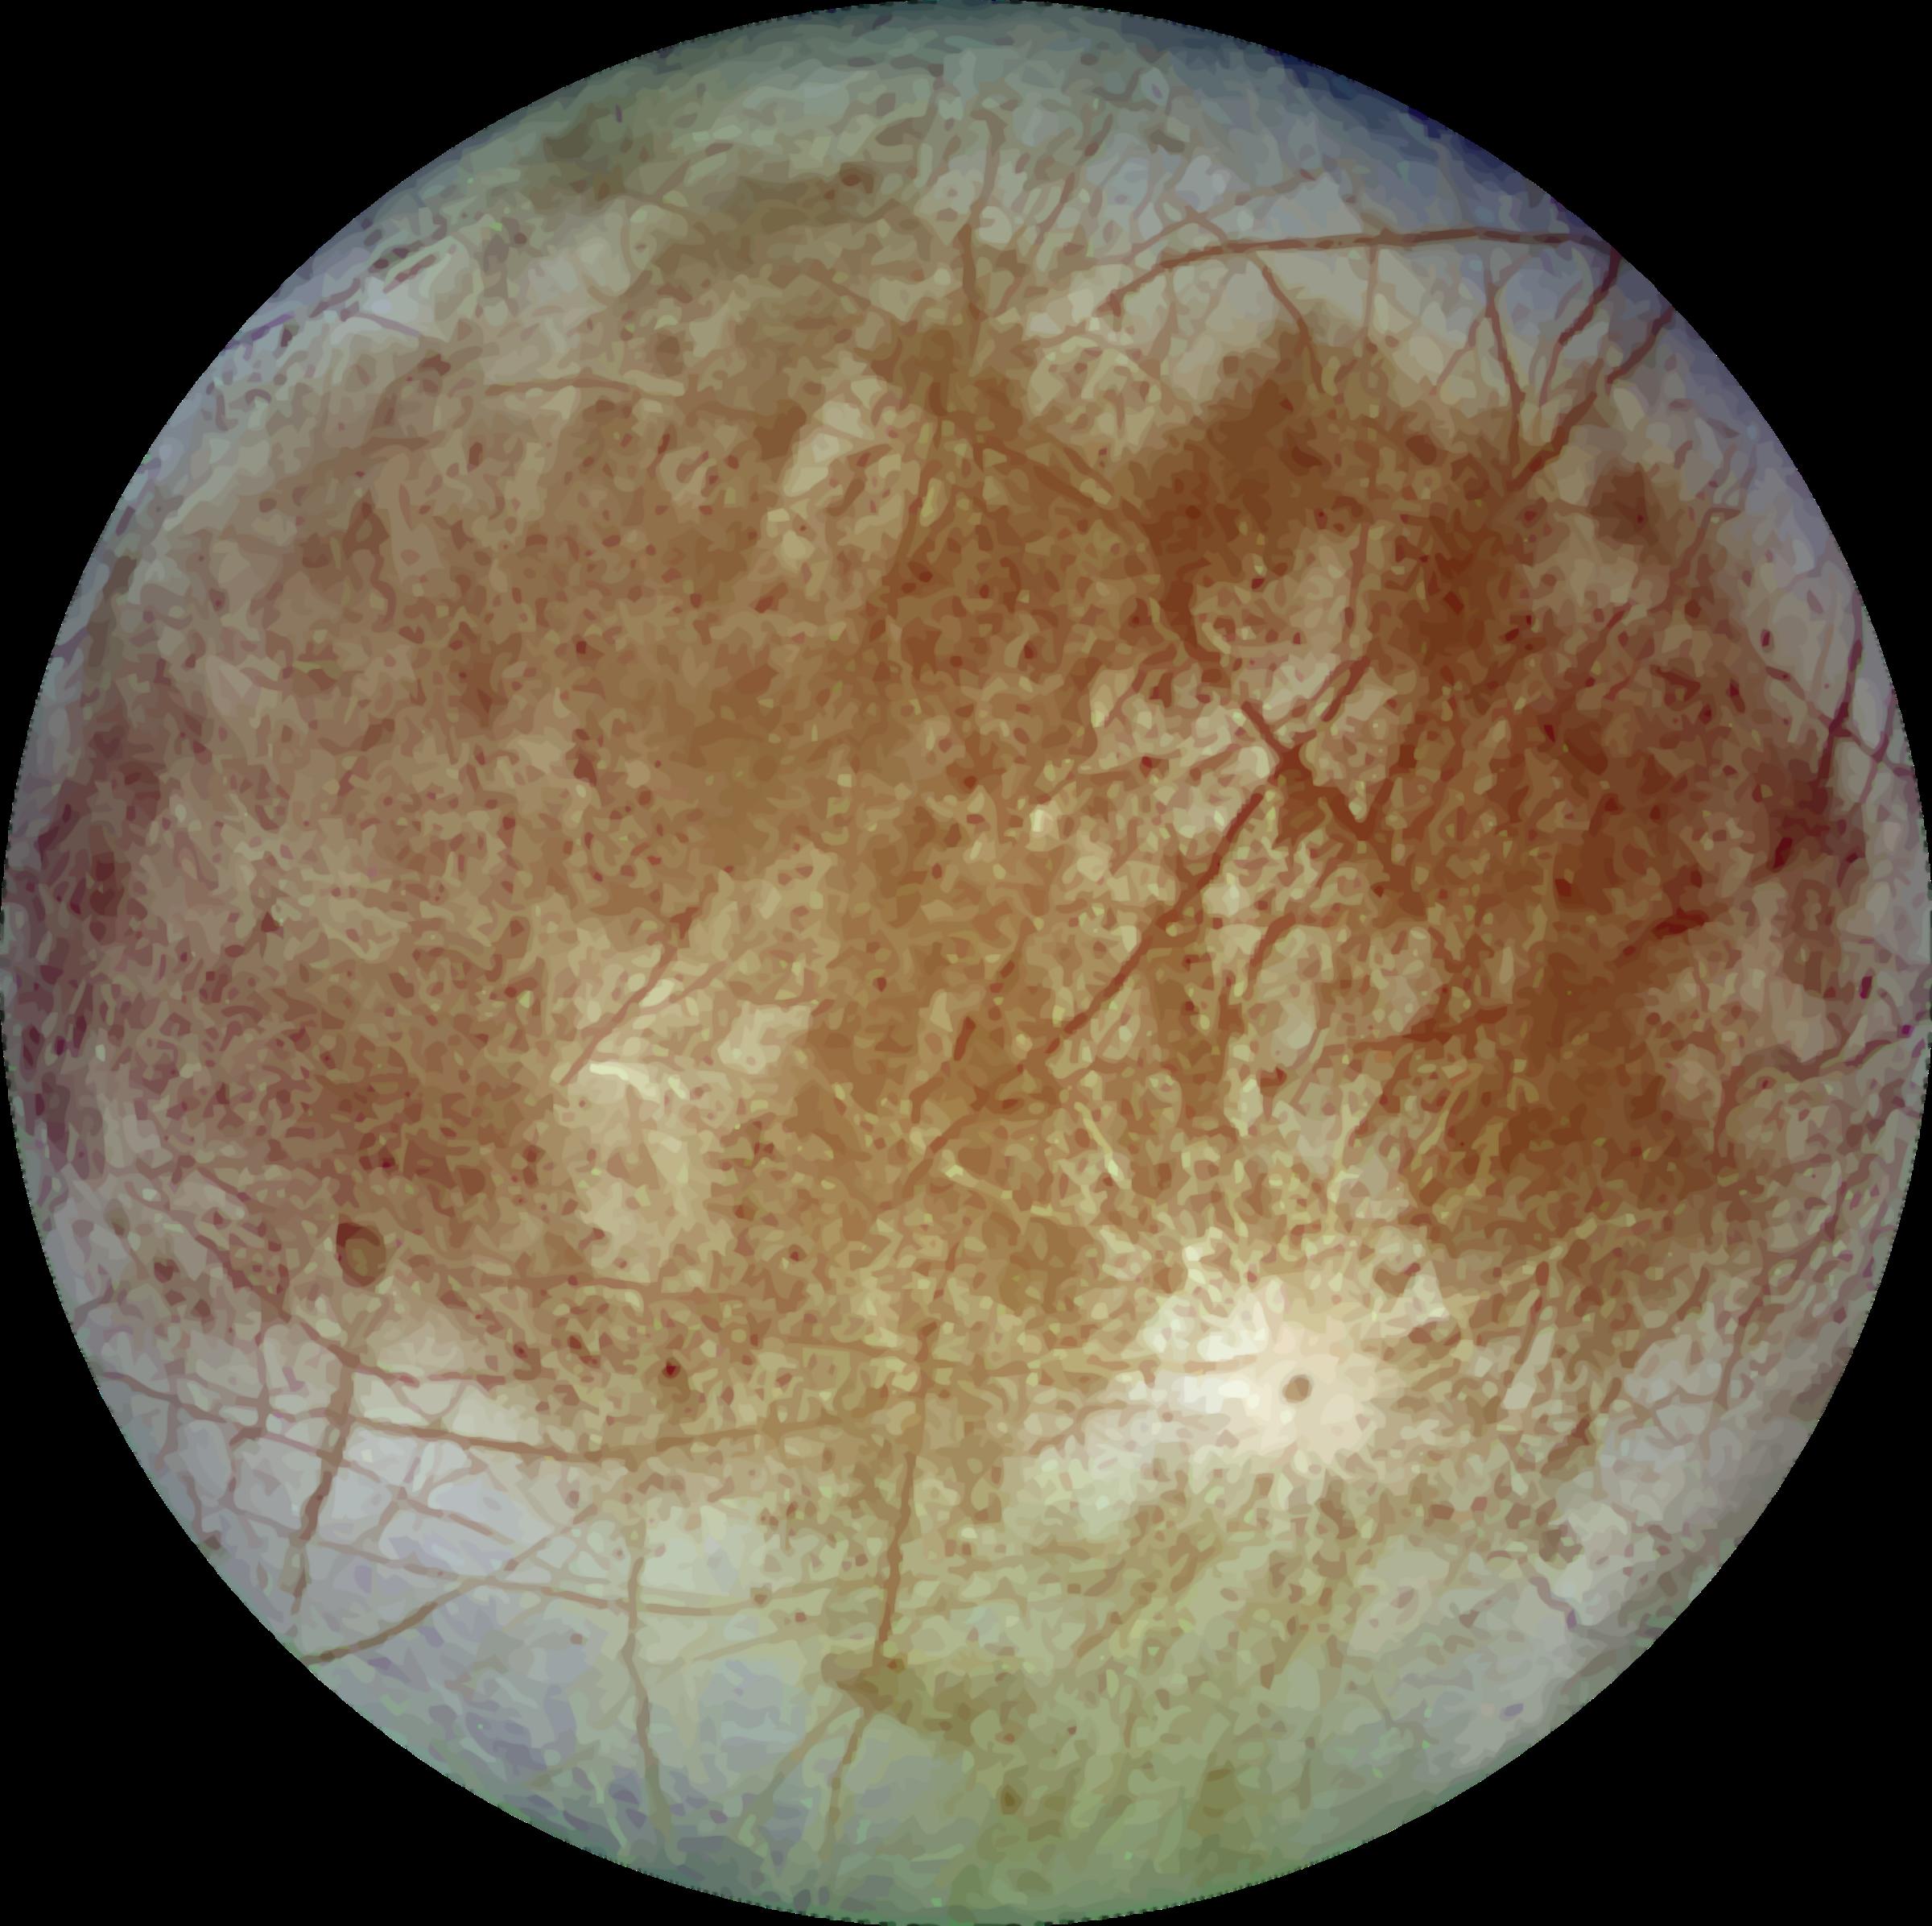 Lunar clipart europa Bibliography